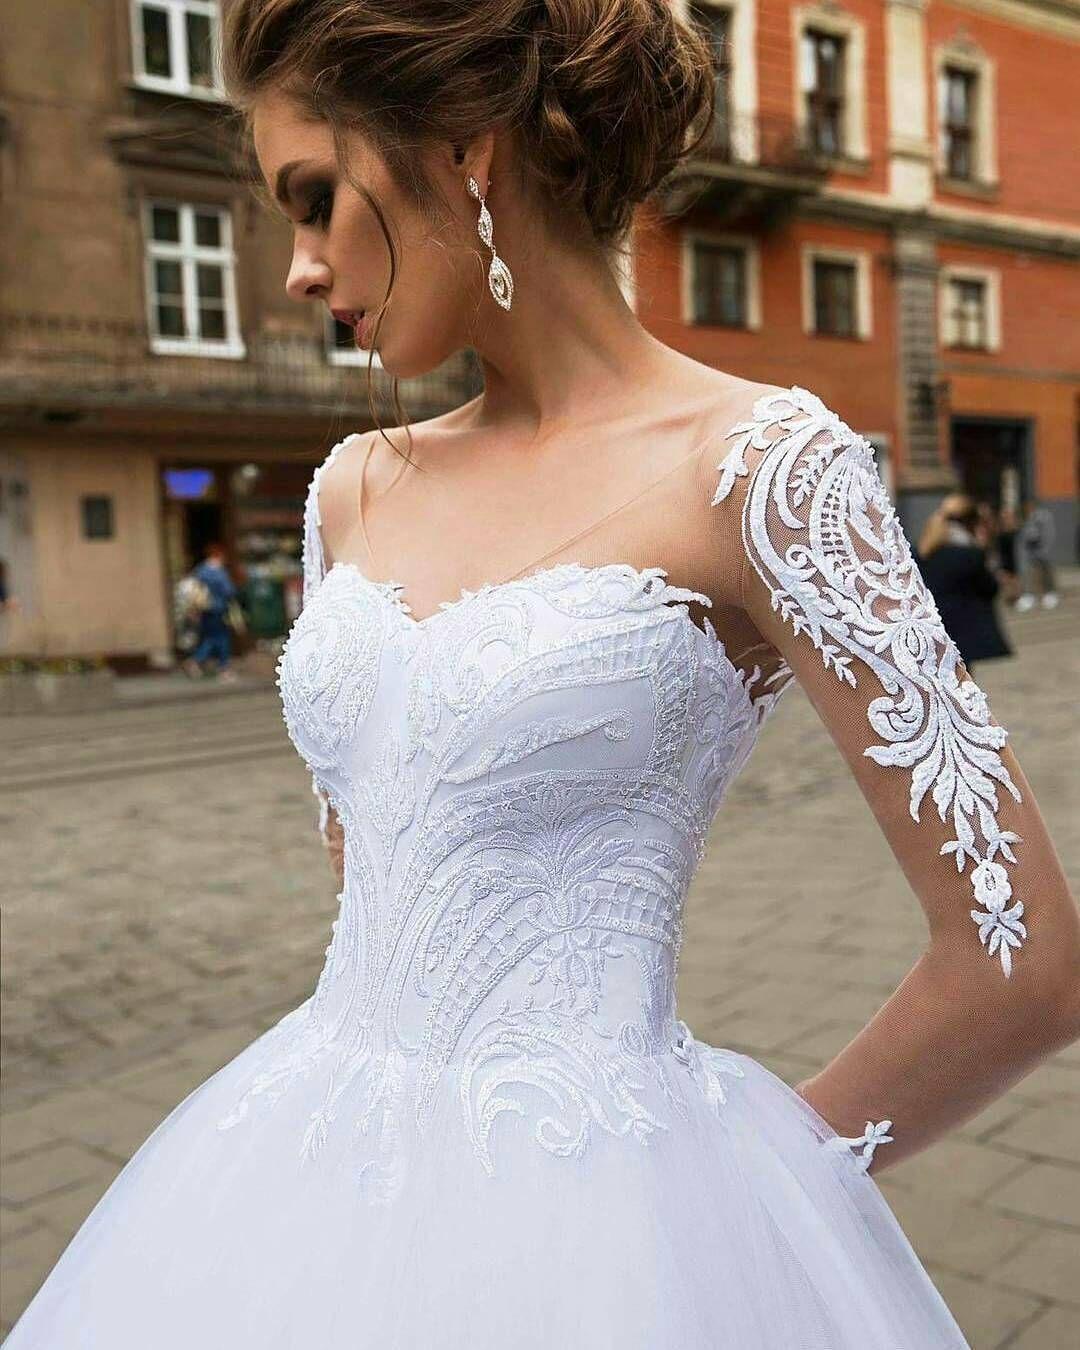 Bridal Style Pic Via At Heradresses At Russianoivas Vestidos